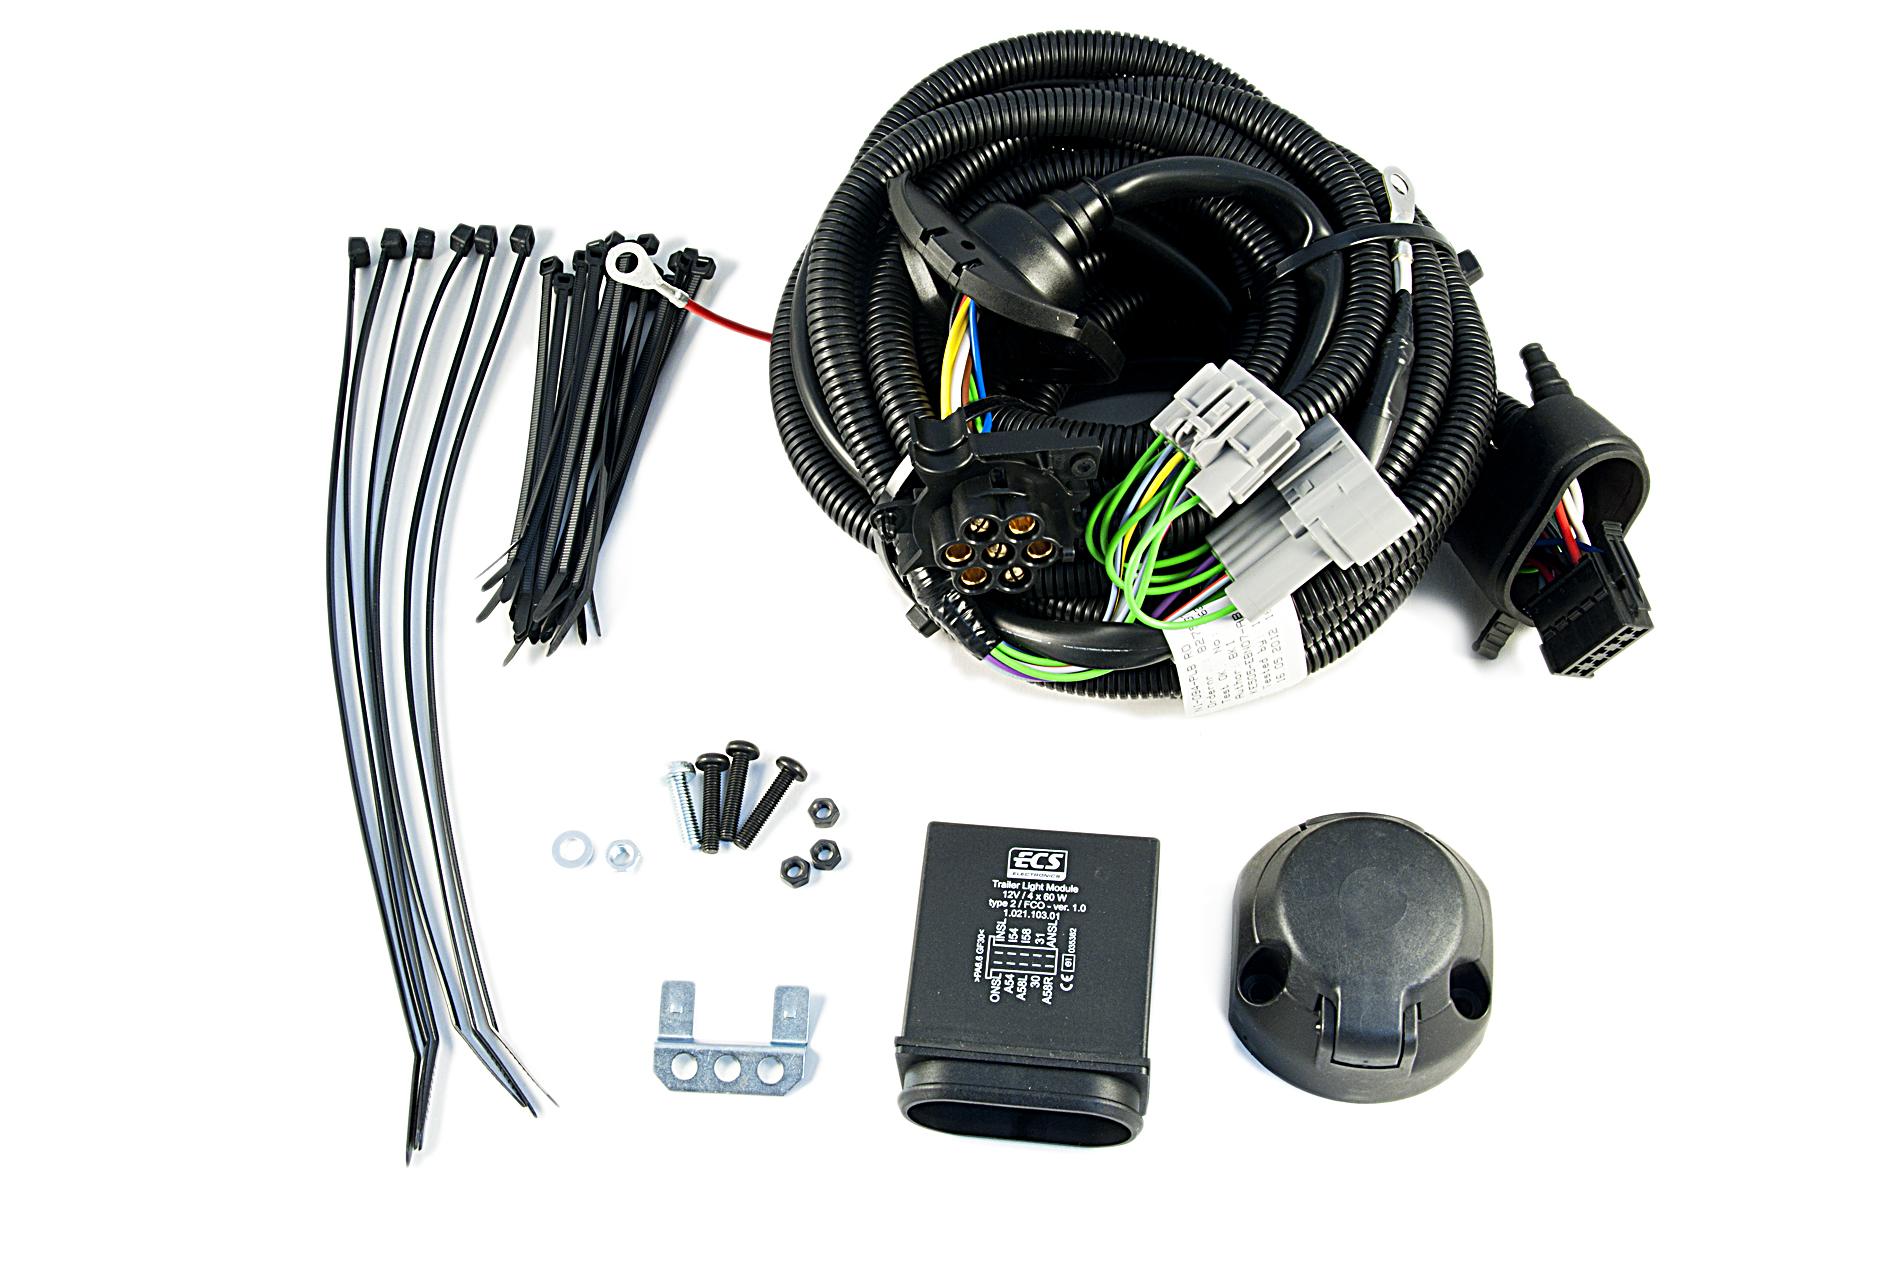 Nissan Genuine 7 Pin Electrical Kit Wiring For Towbar Hitch Trailer Ke505ebn07ab